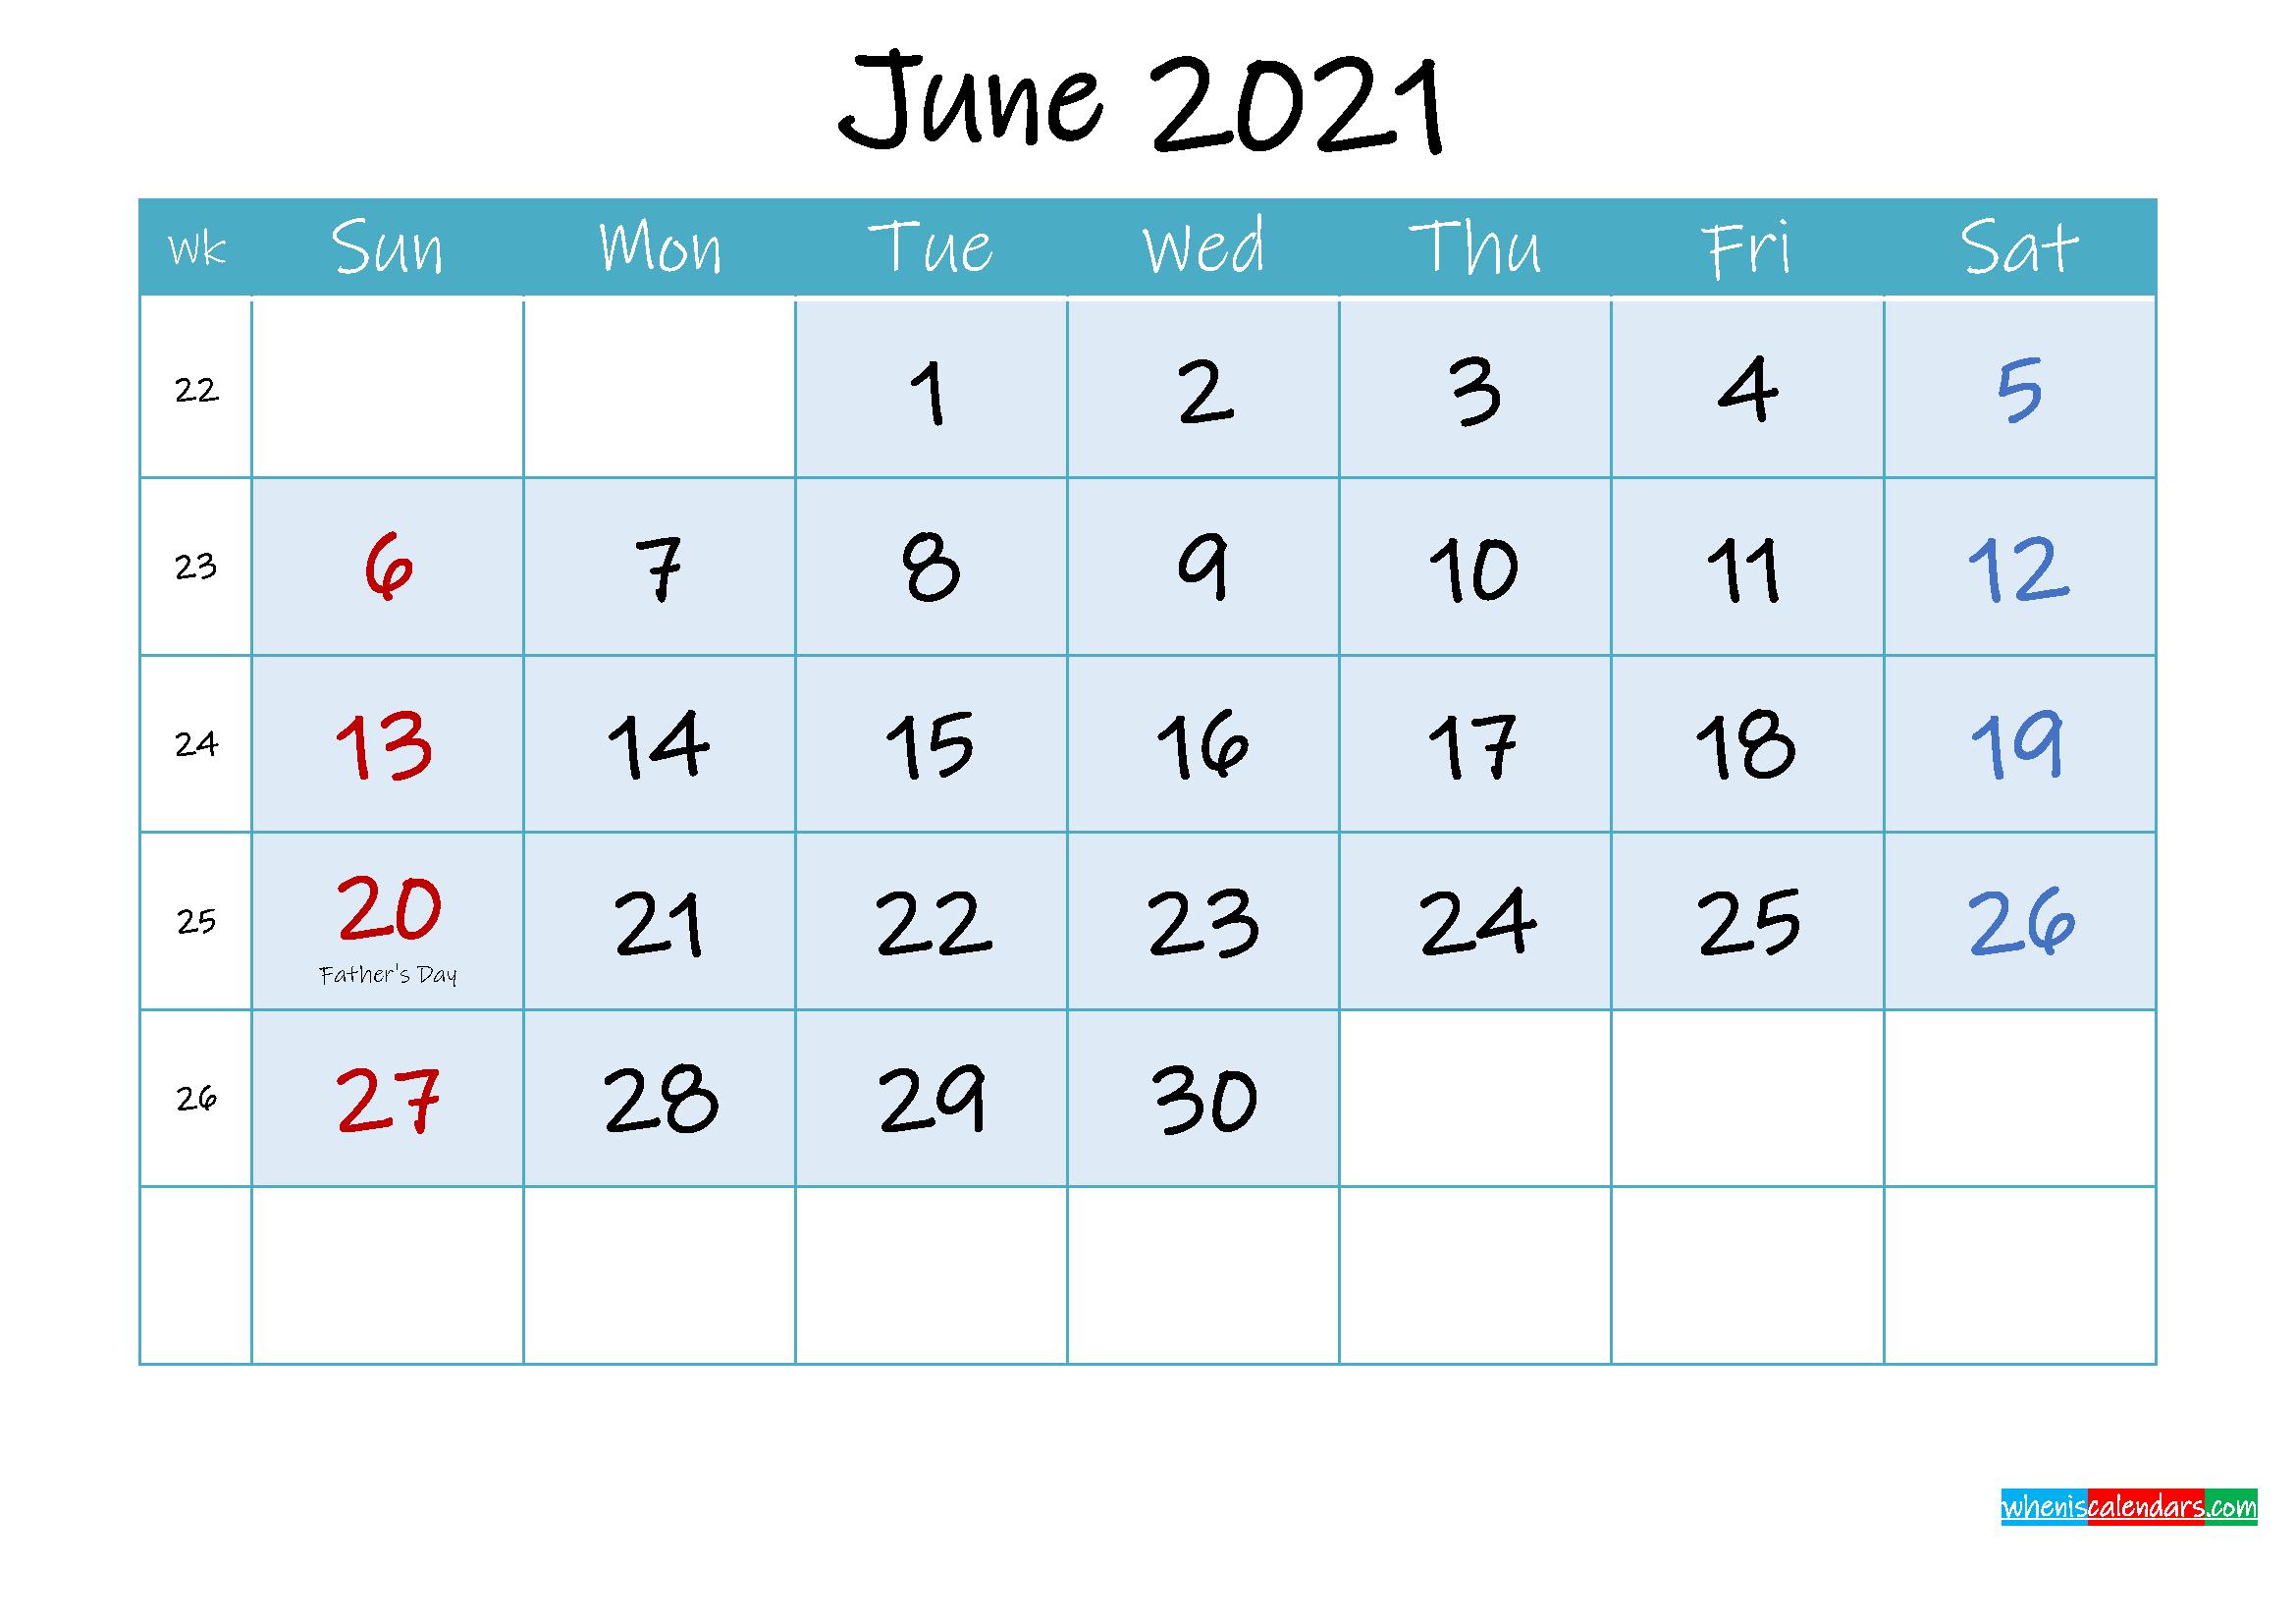 June 2021 Free Printable Calendar with Holidays